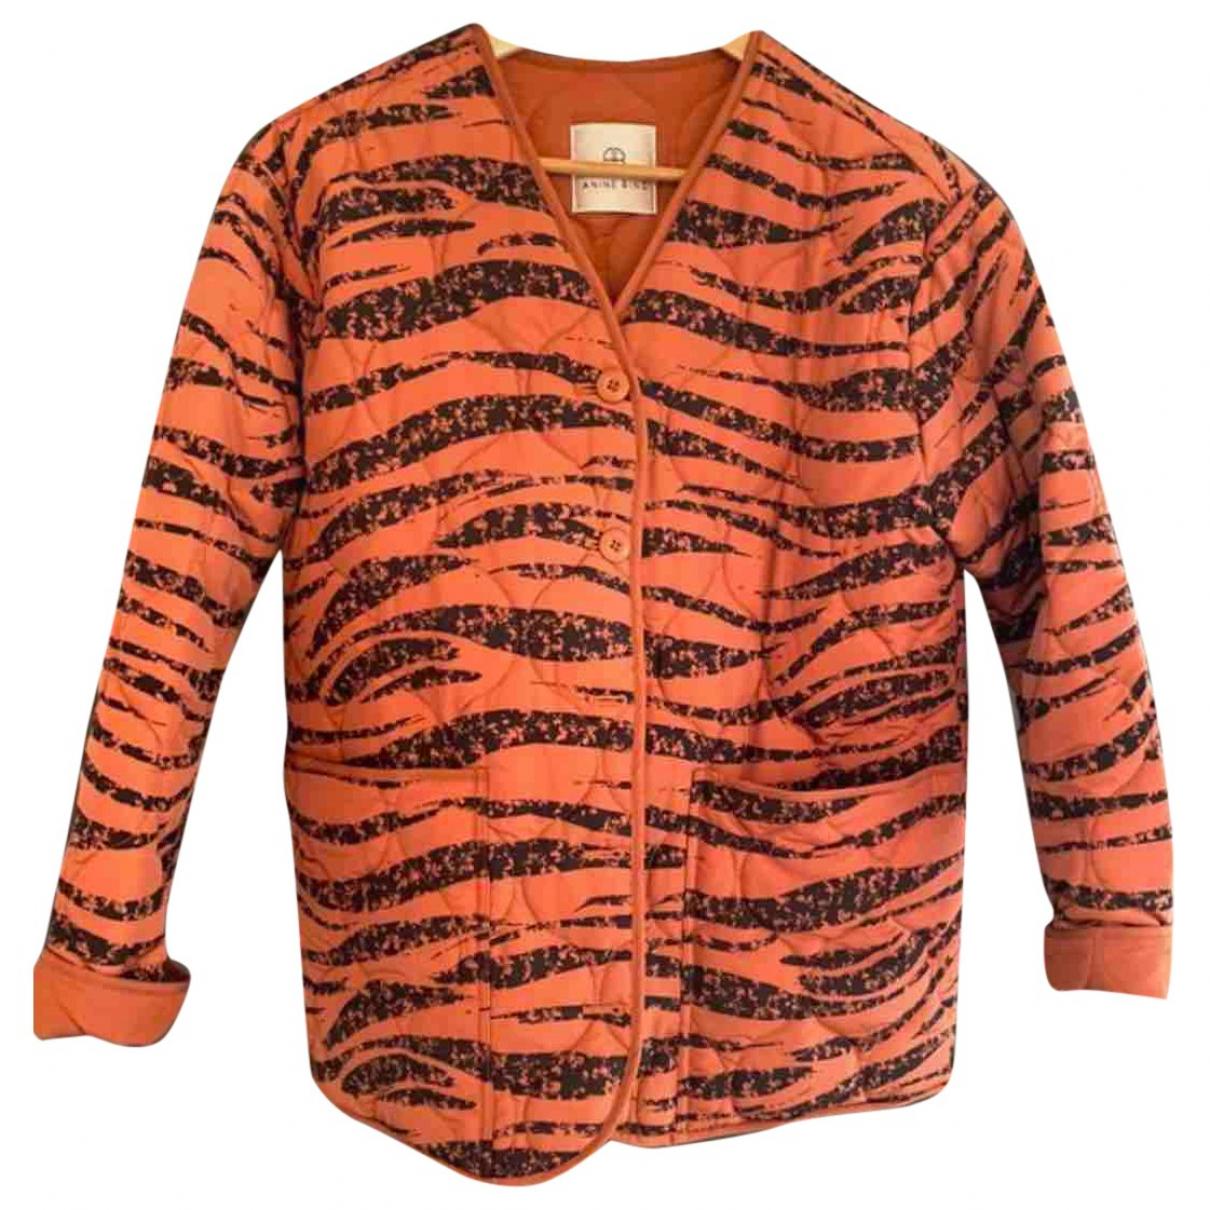 Anine Bing Fall Winter 2019 Jacke in  Orange Polyester